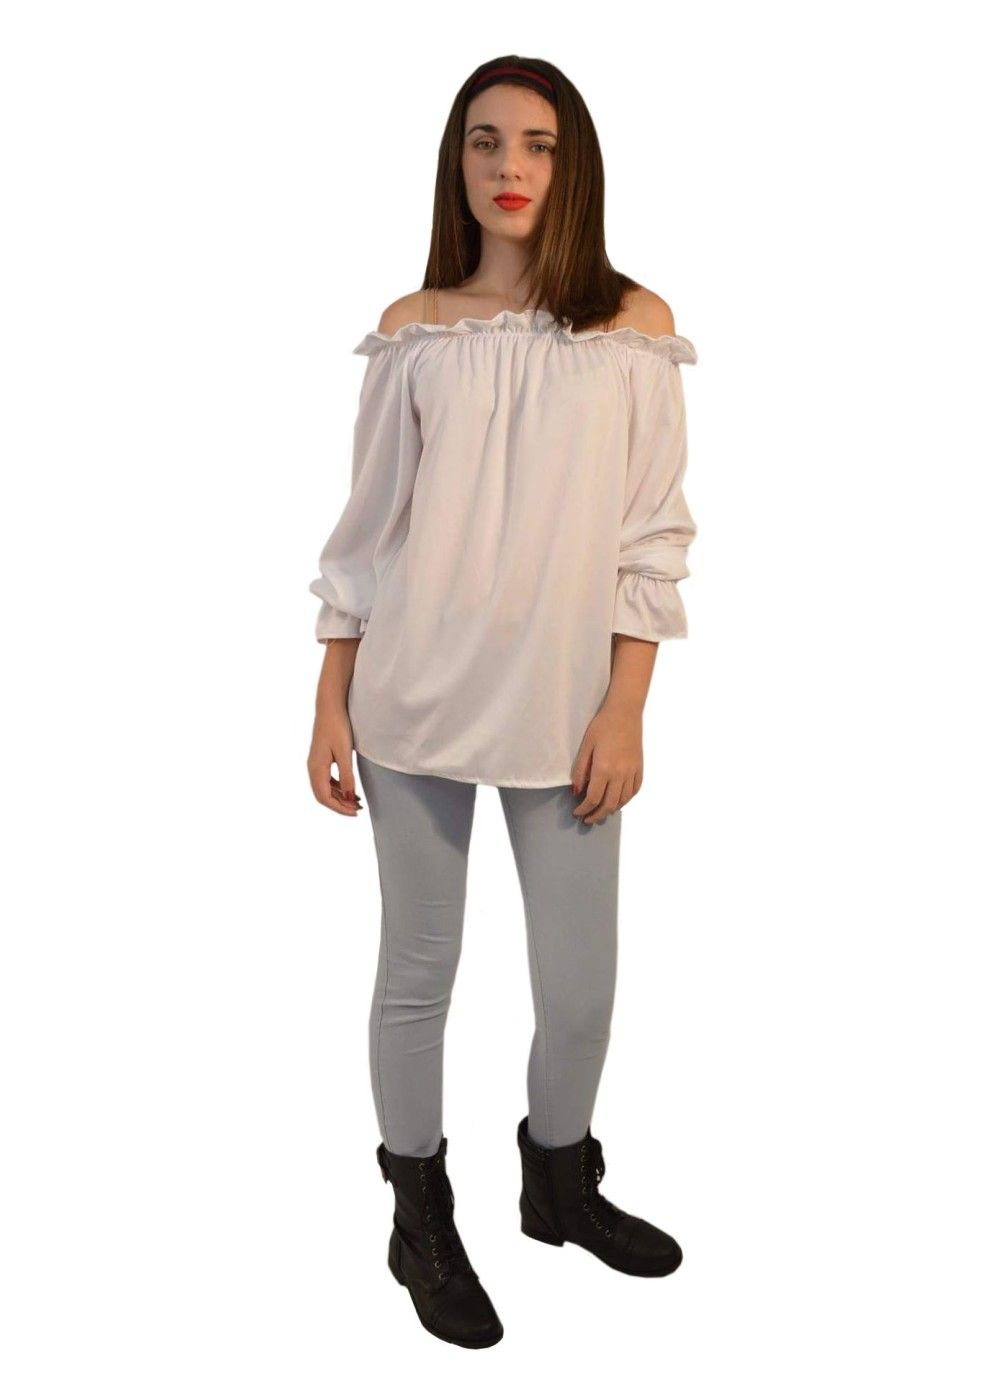 8f7426a1661c55 Renaissance Long Sleeve White Blouse Women Shirt